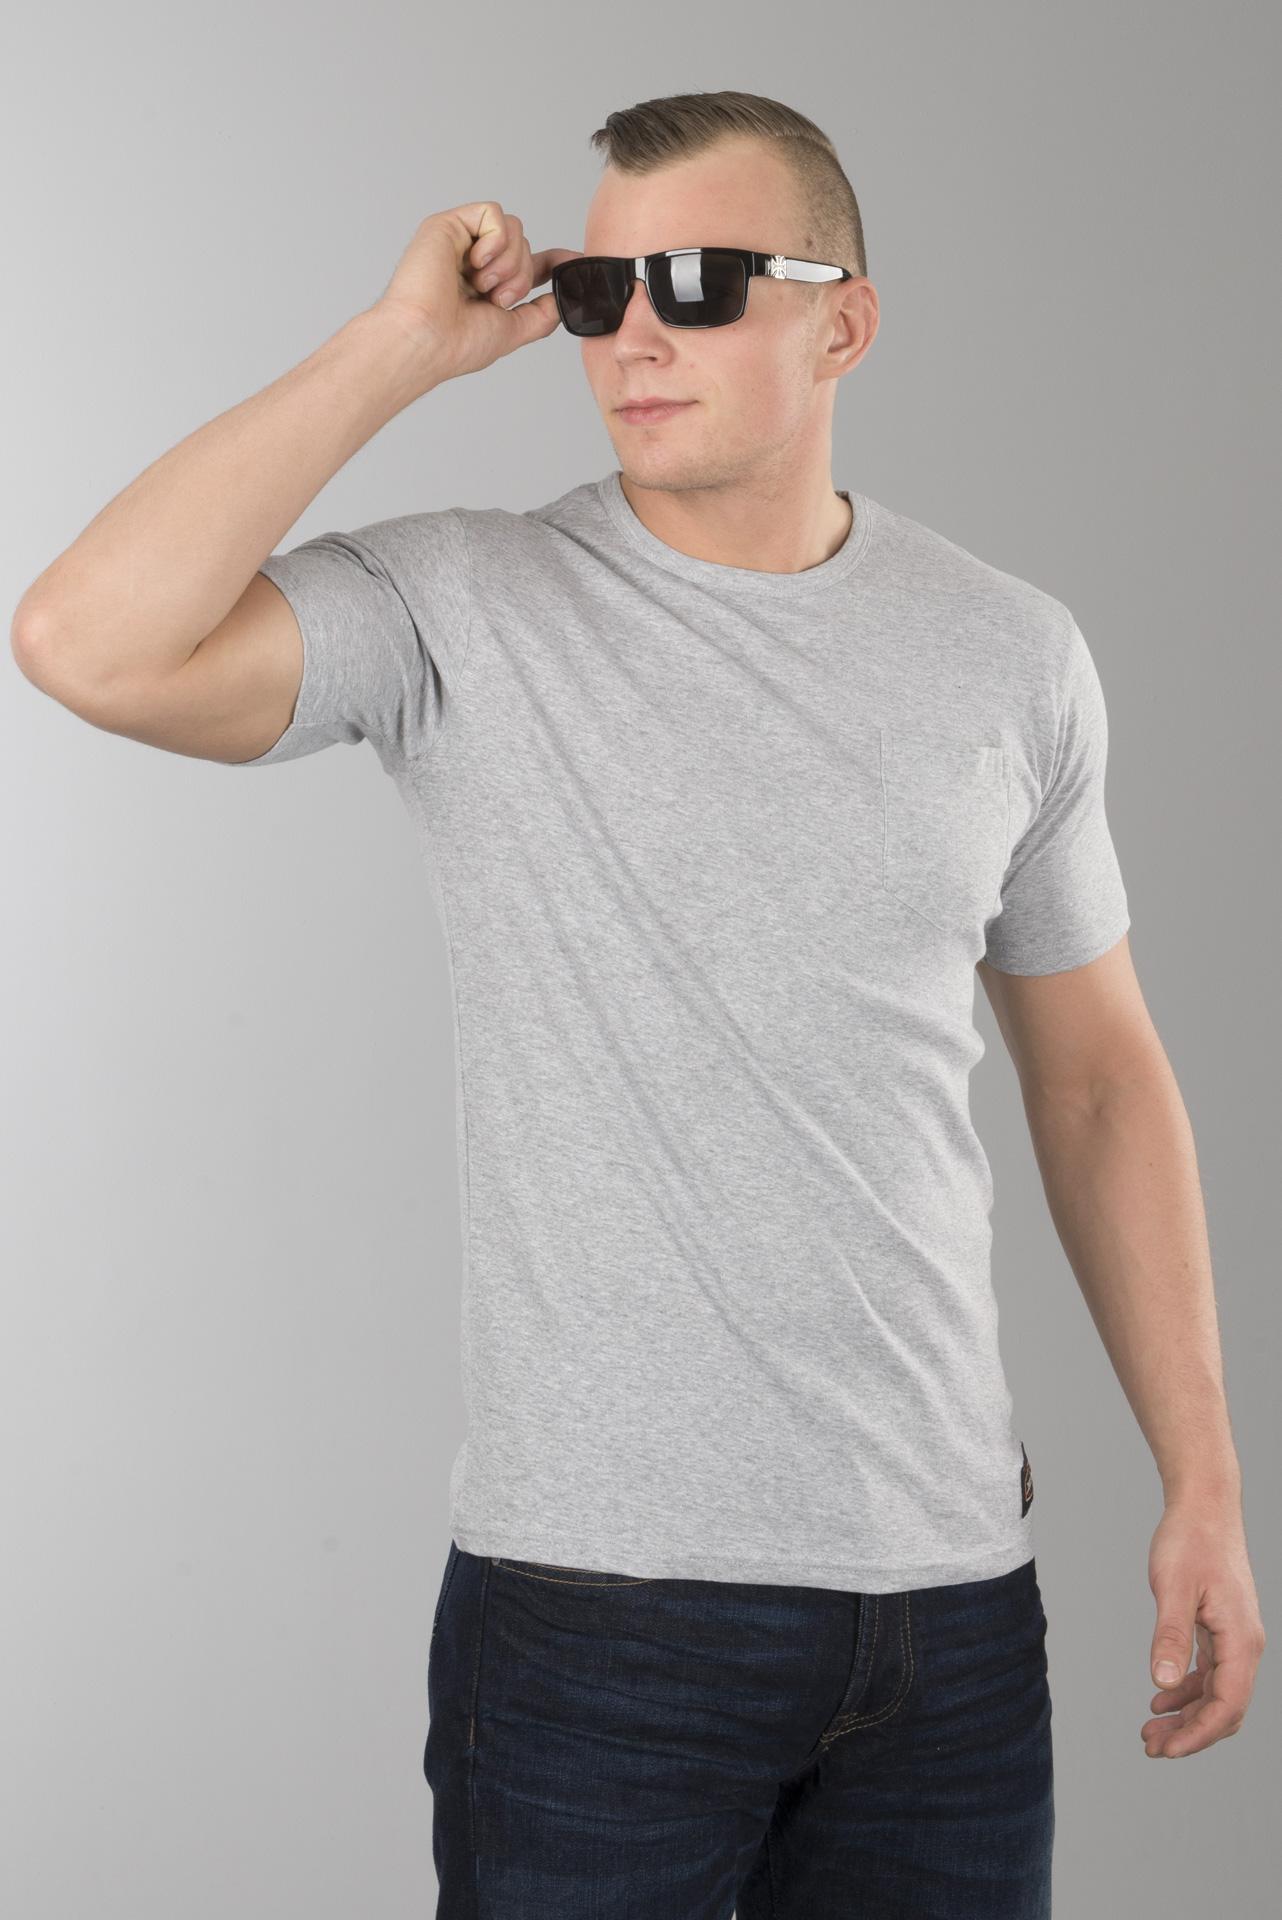 T Skjorte Macna Dazzle Logo Grå Svart Gul Nå 21% Du sparer